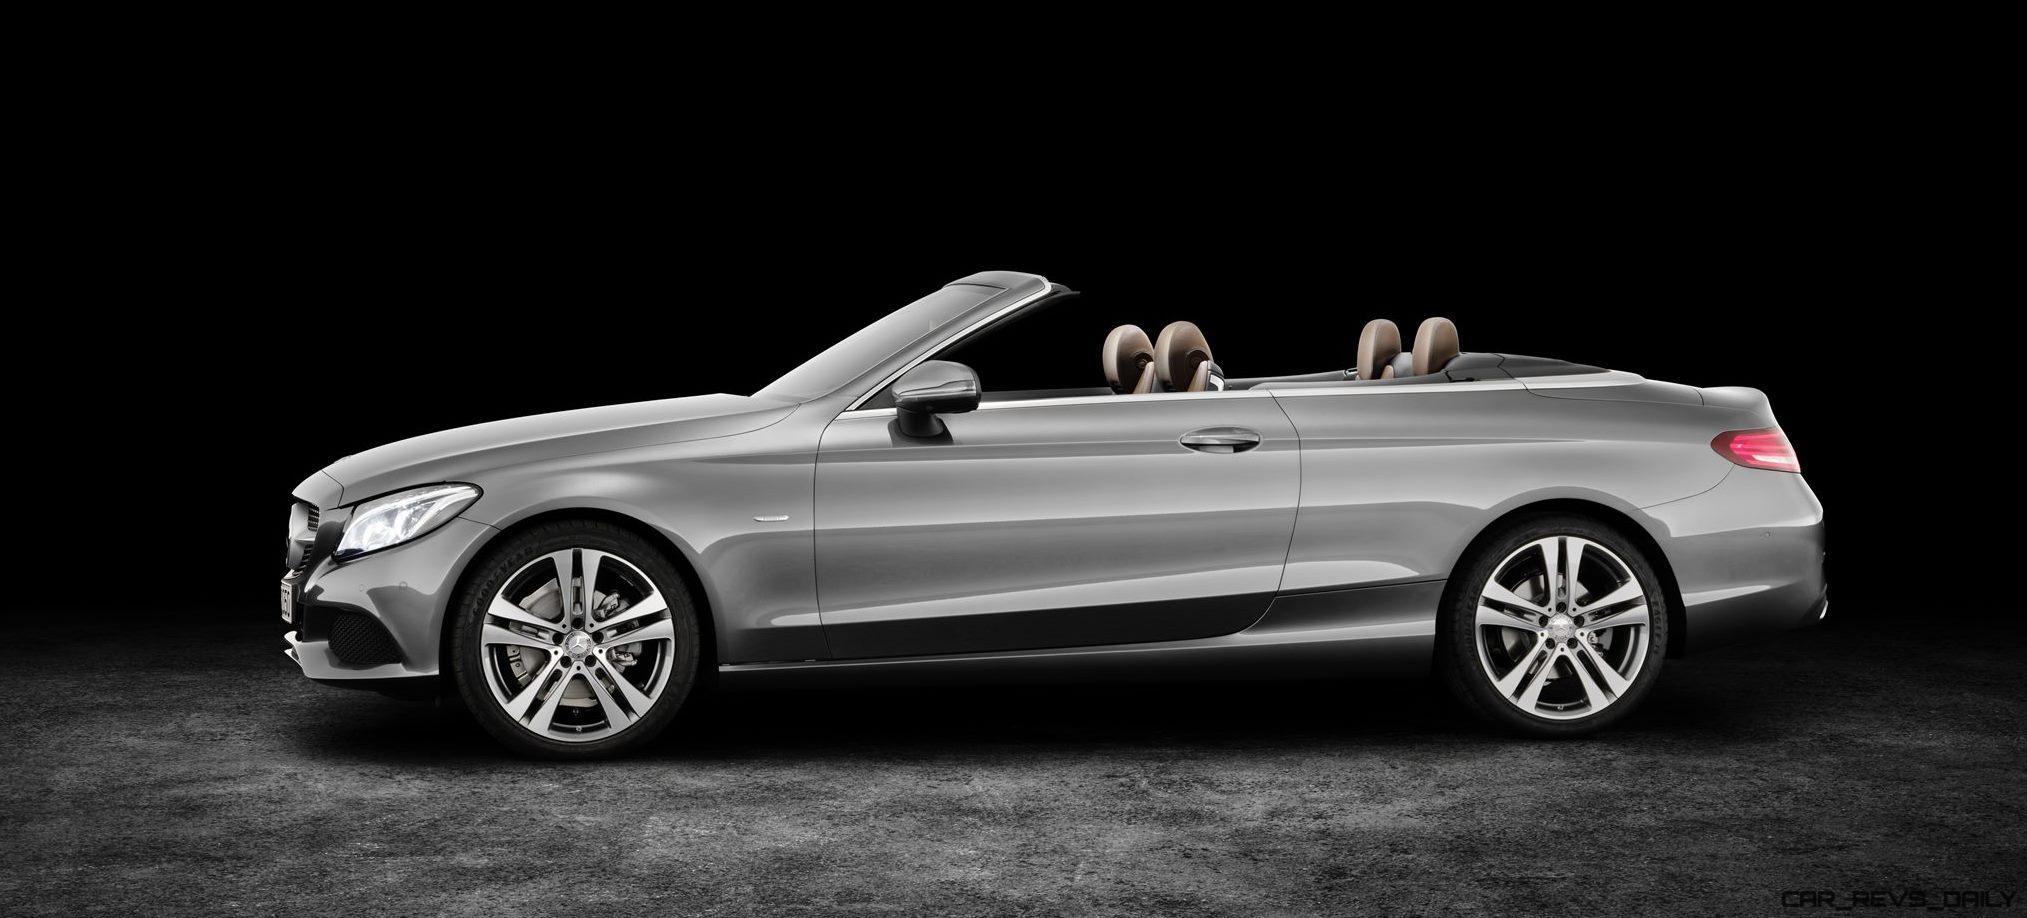 update1 367hp 2017 mercedes benz c43 cabrio leads gorgeous new c class convertible line car. Black Bedroom Furniture Sets. Home Design Ideas